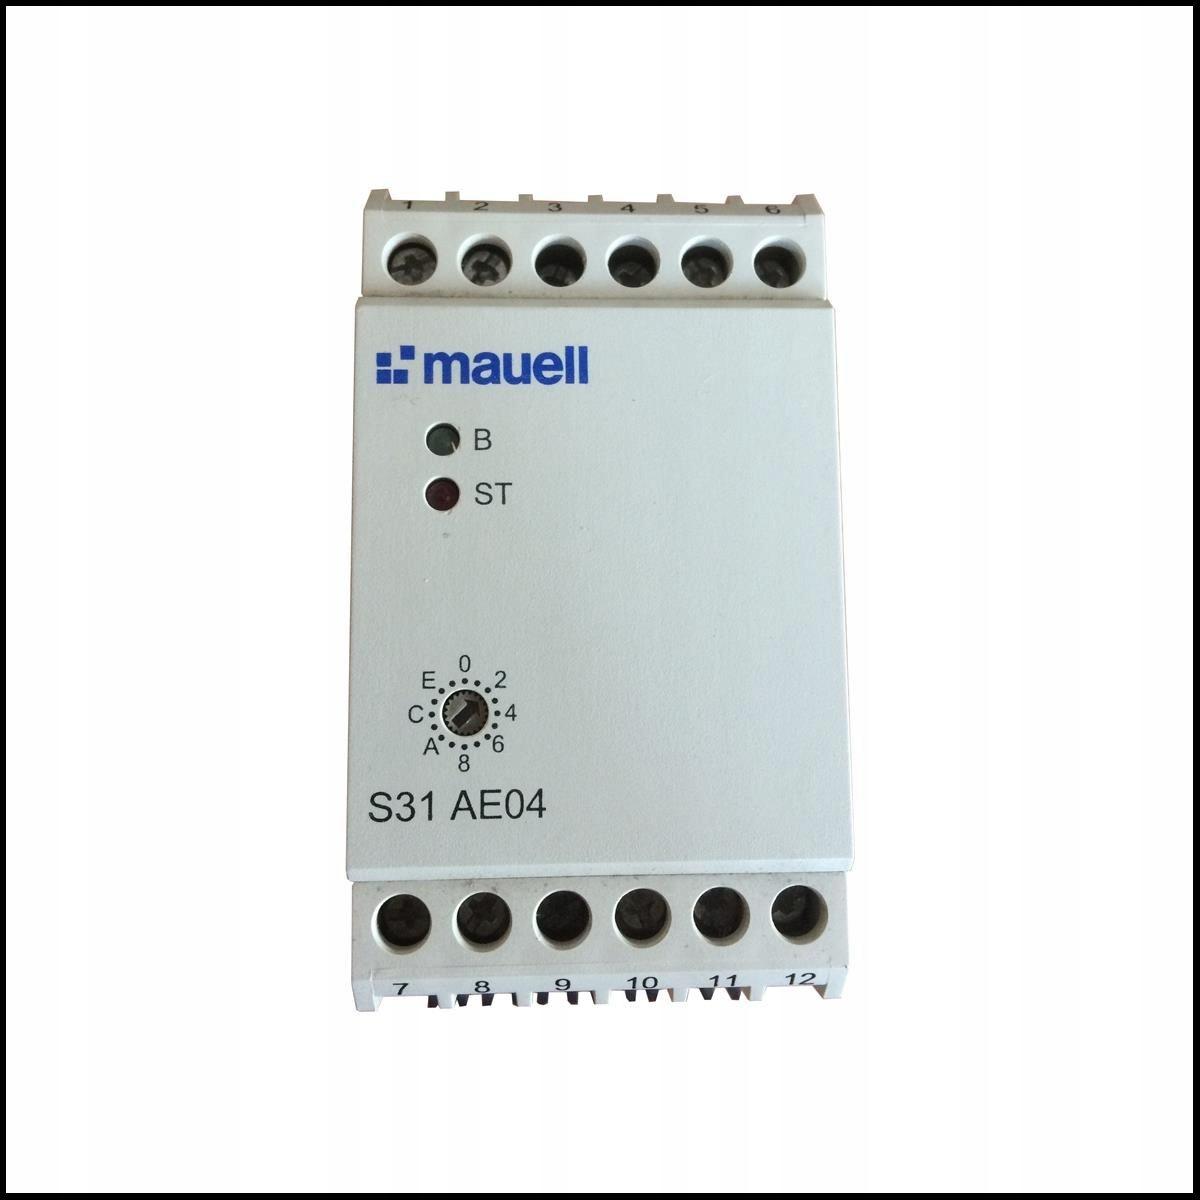 ME30 telmatic S31 AE04 - Mauell - 30-96-331